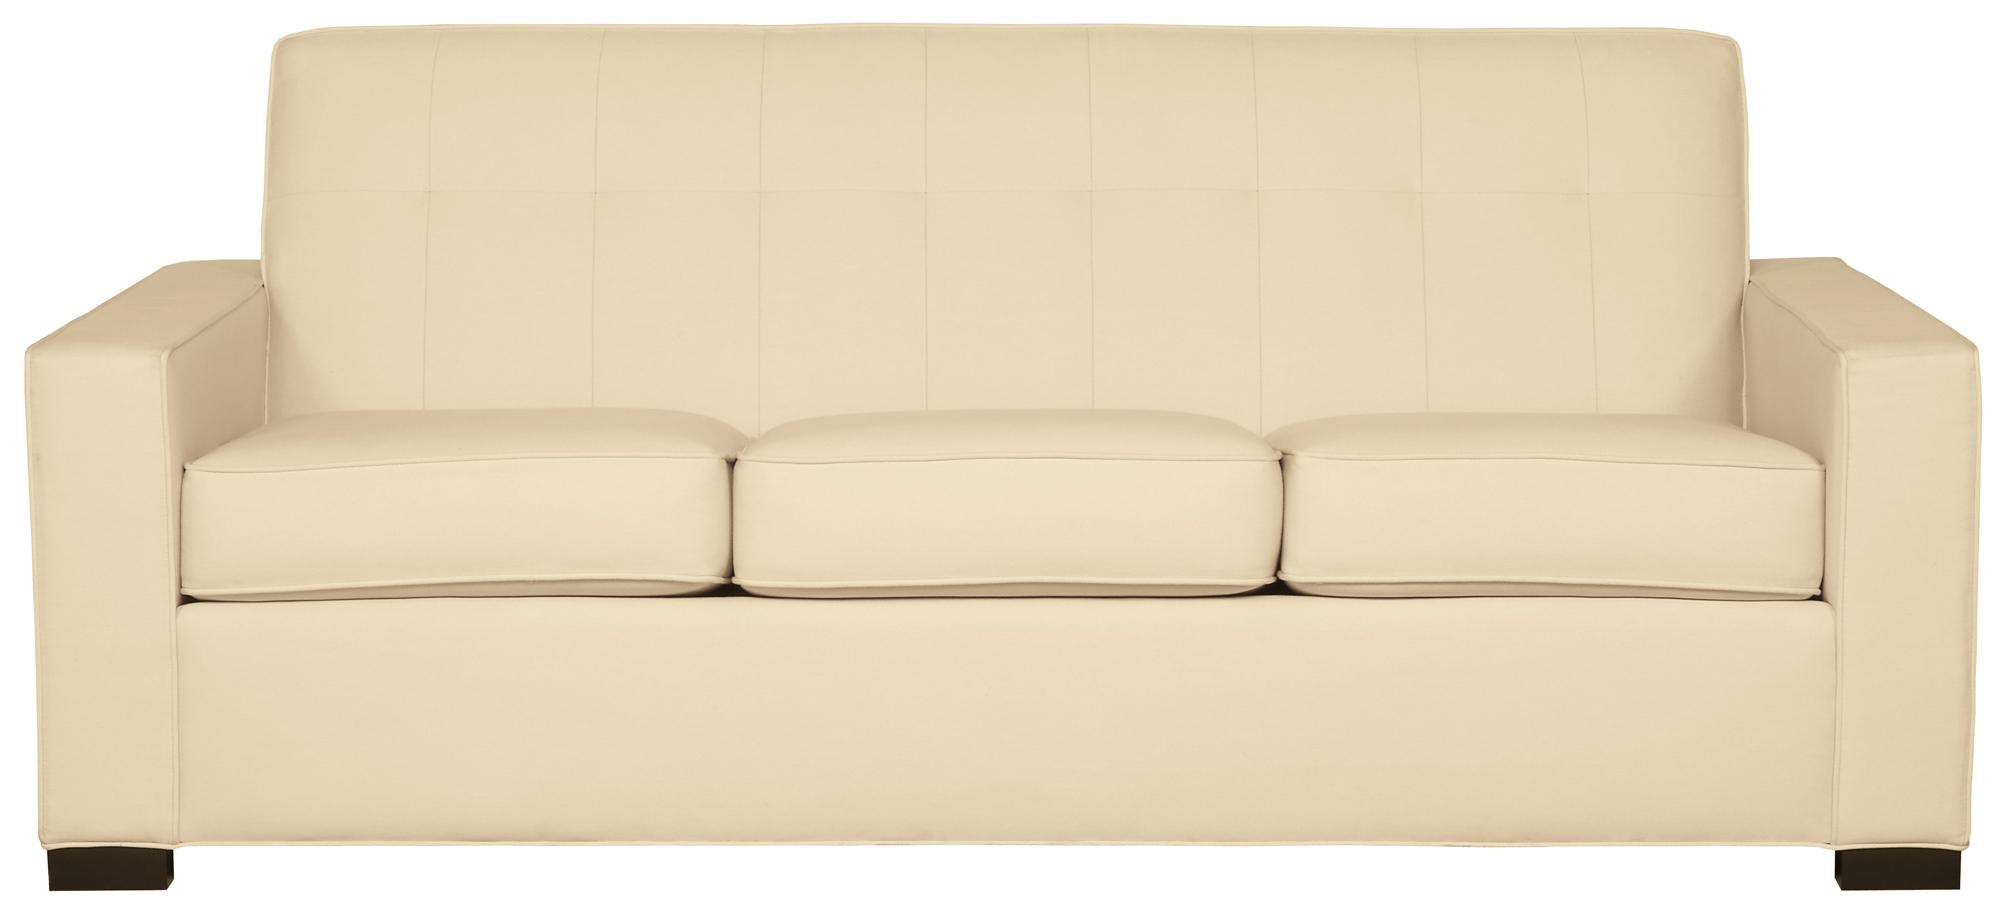 Sofa 81 Bernhardt Hospitality